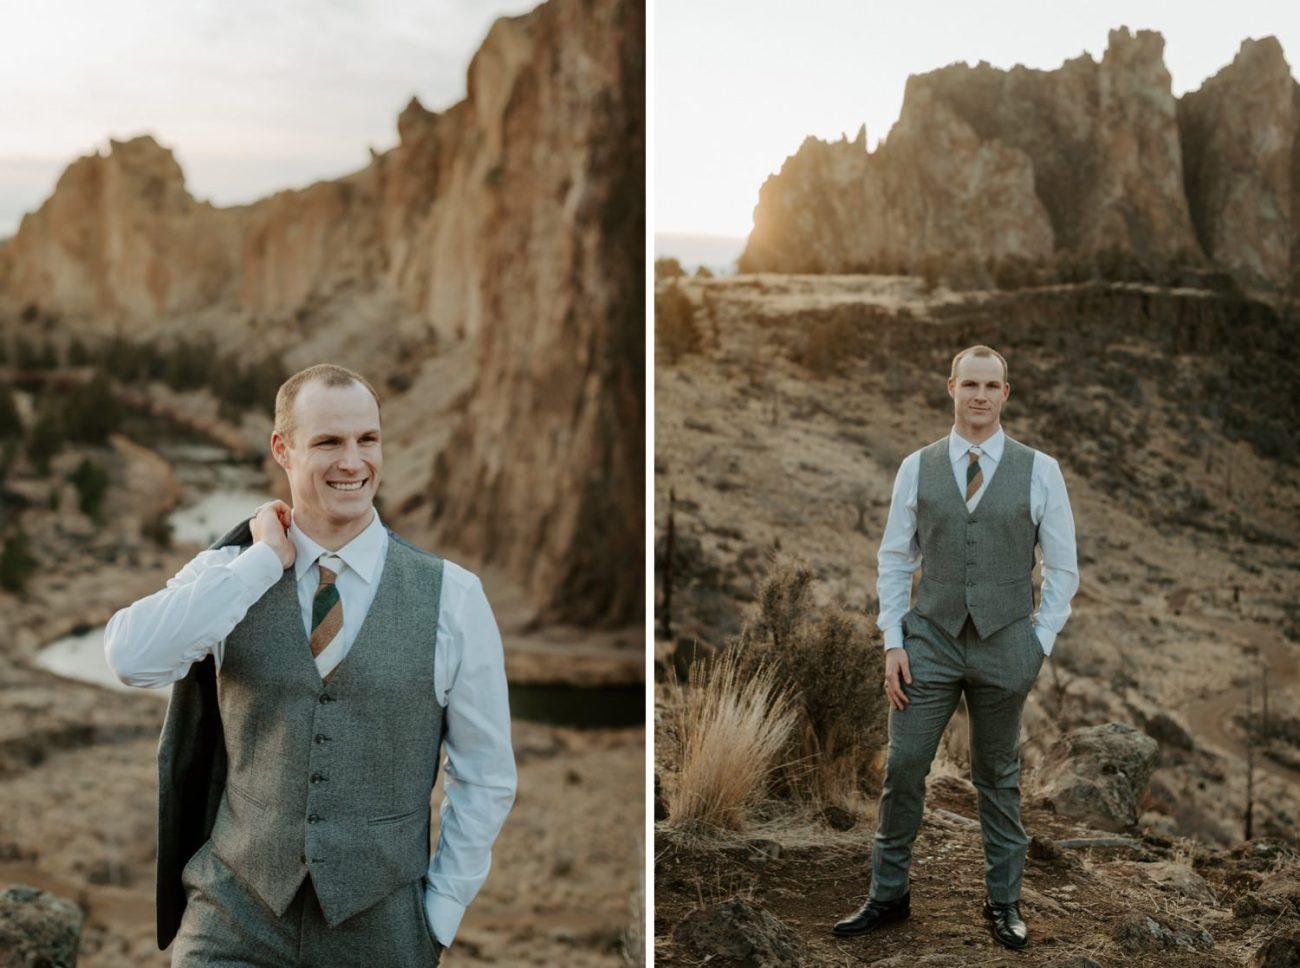 Smith Rock State Park Elopement Bend Oregon Elopement Photographer Anais Possamai Photography 029